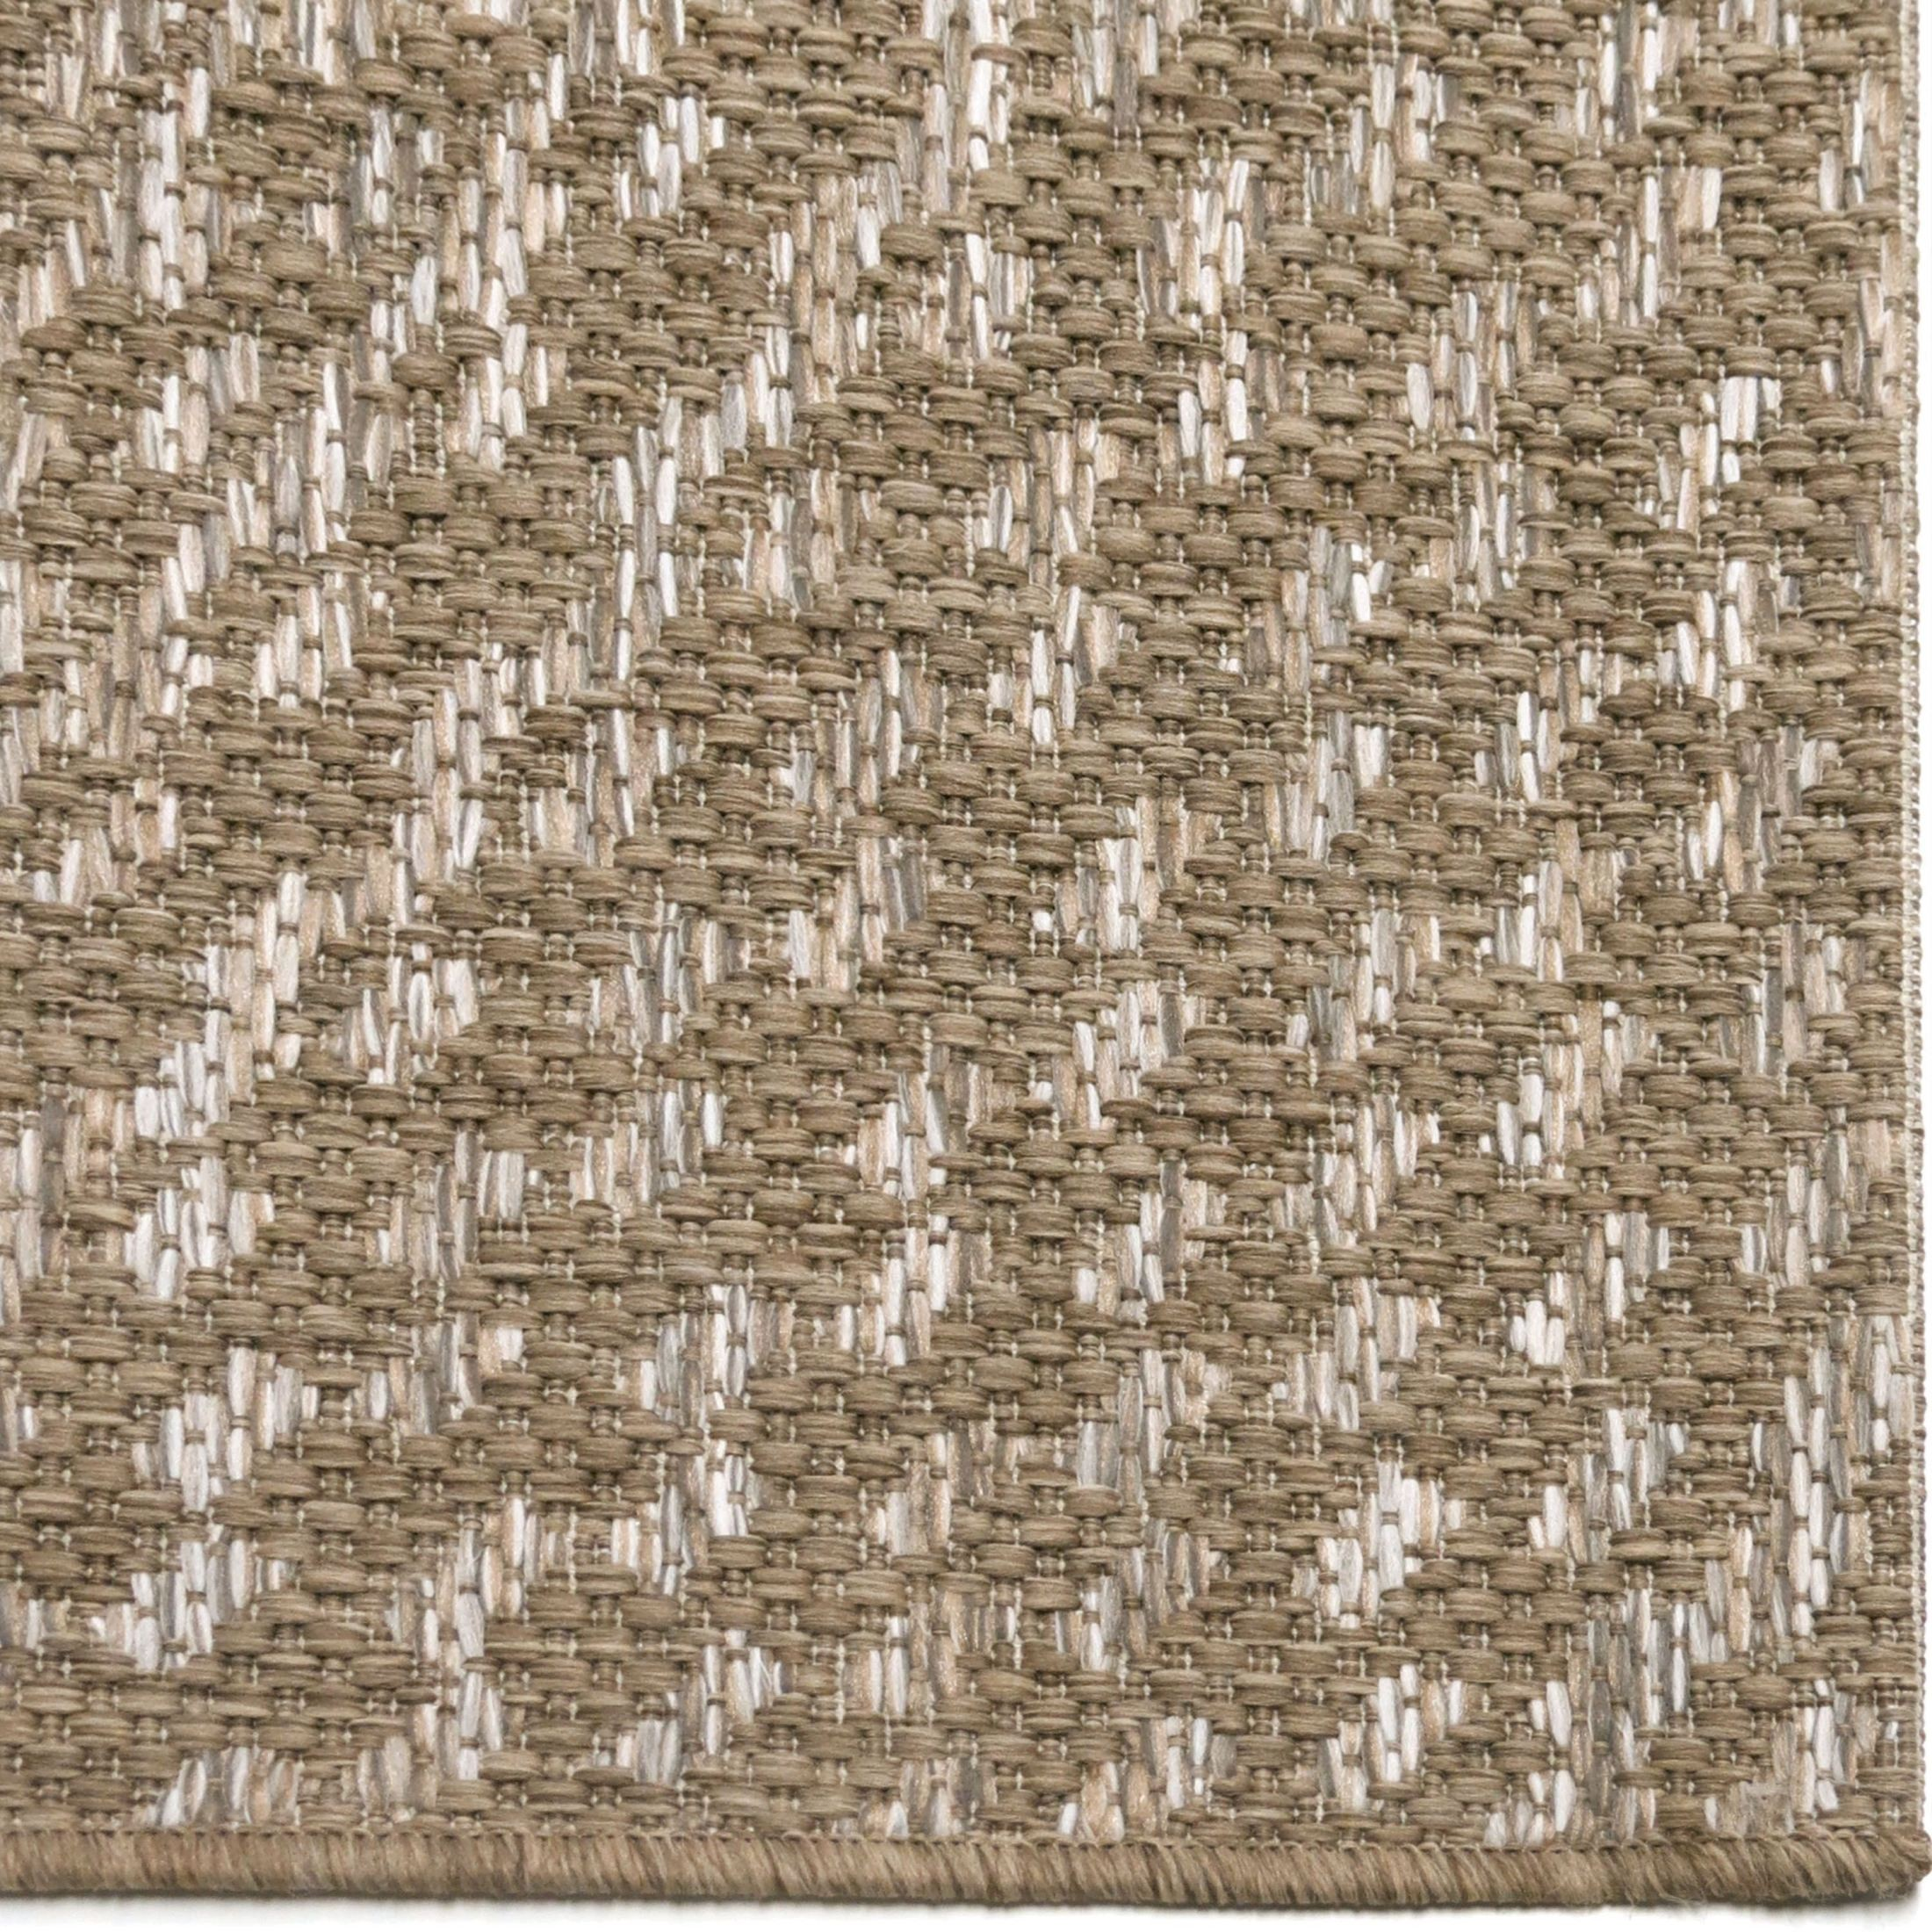 Gray Area Rug 8x11: Orian Rugs Indoor/Outdoor Circles Cerulean Gray/ Brown